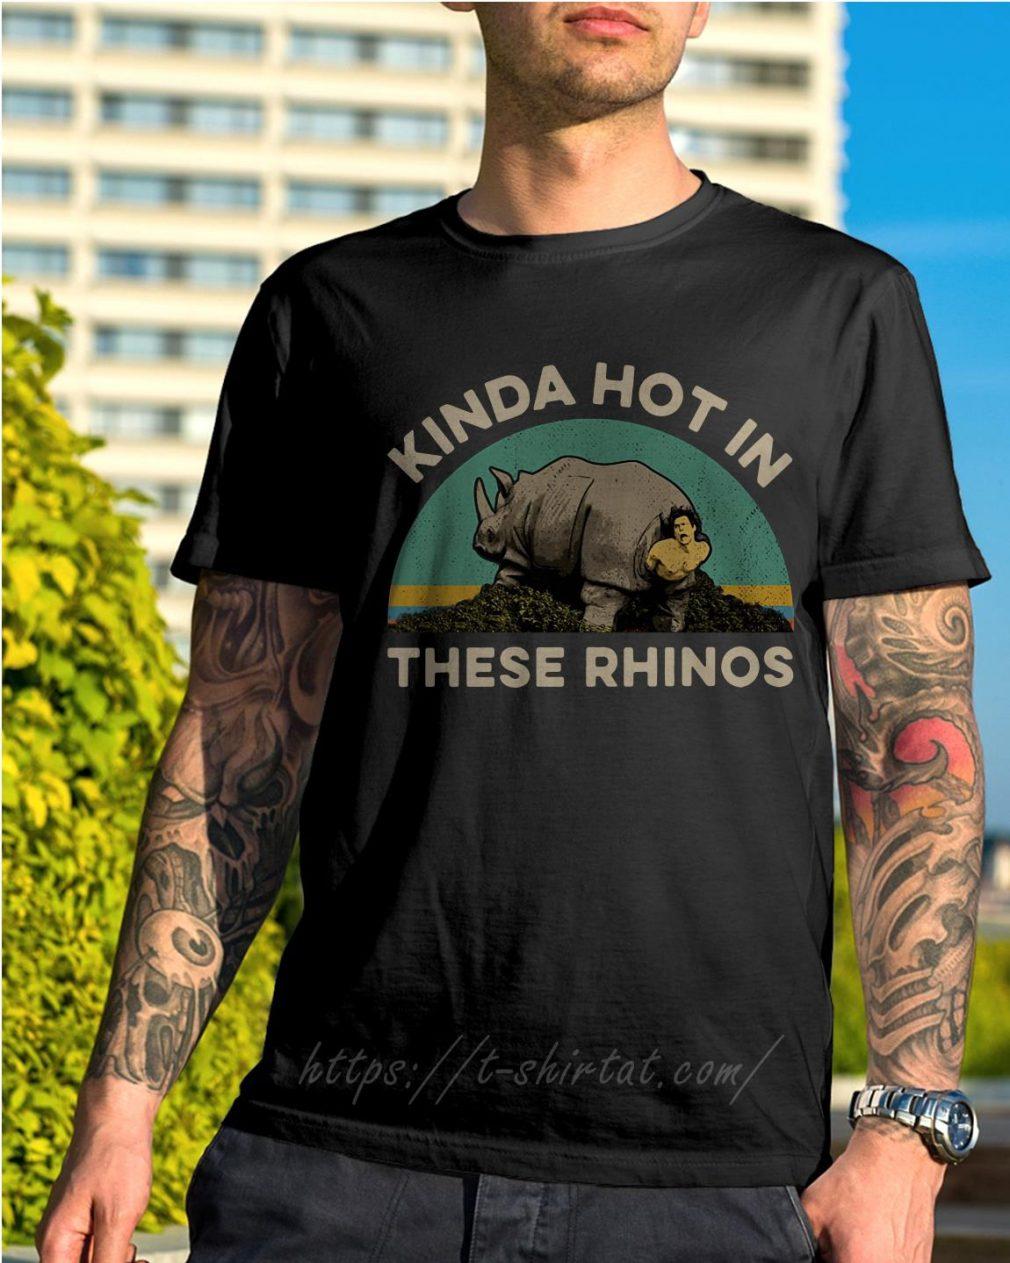 Ace Ventura Kinda hot in these rhinos retro shirt